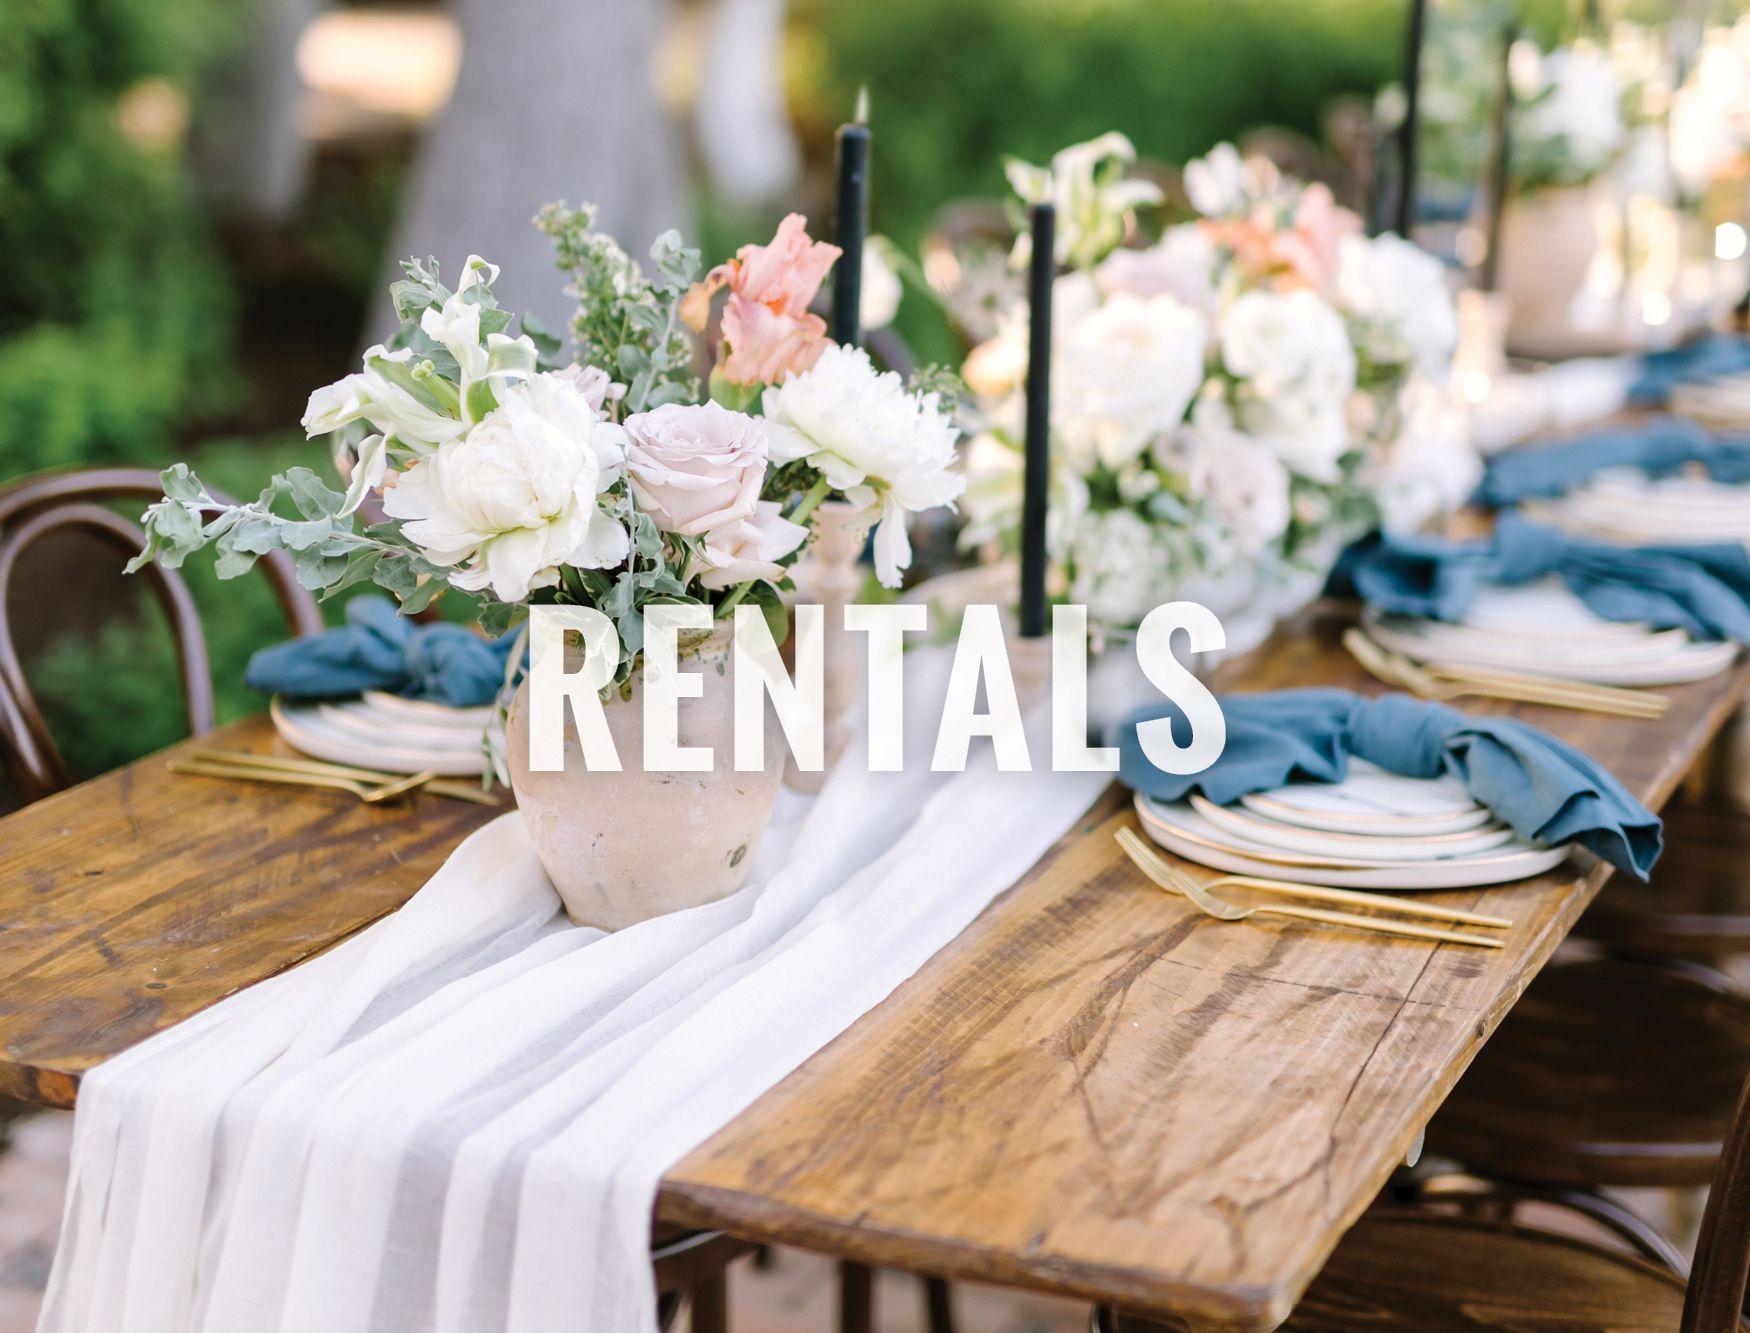 Austin Rental Companies